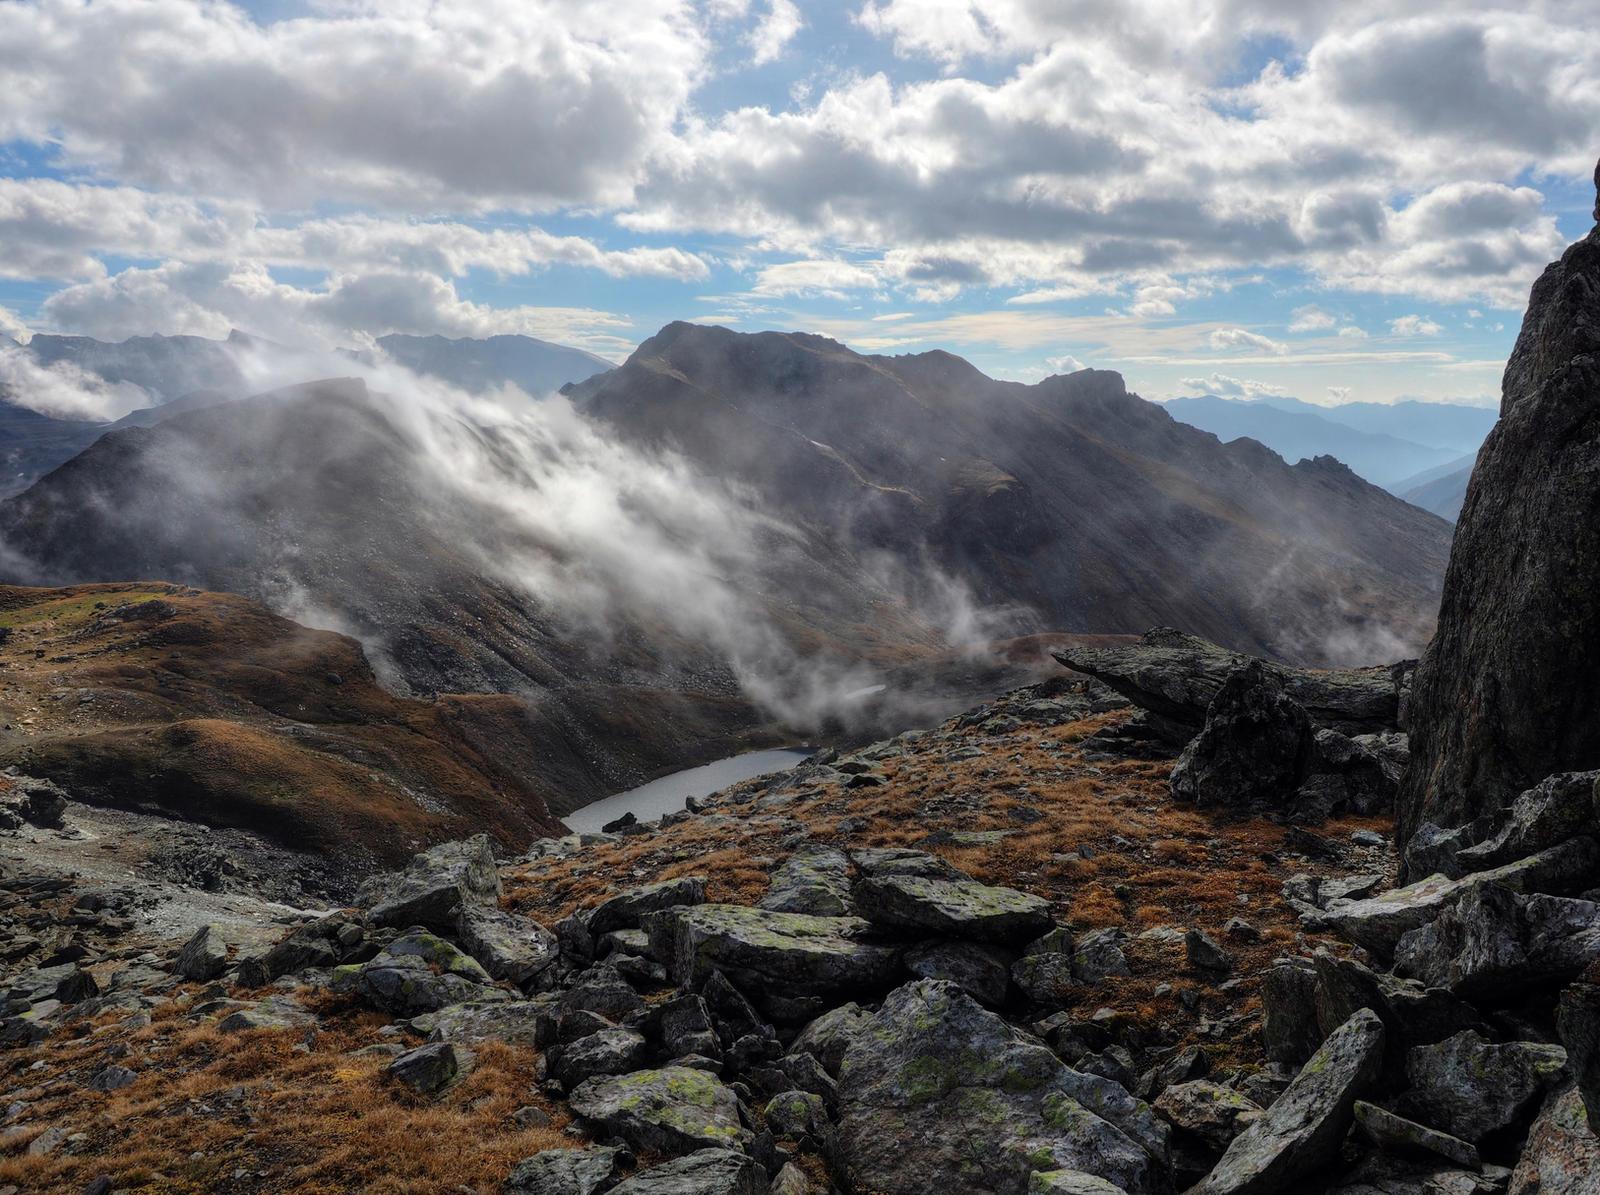 Stormy Oktober by Burtn